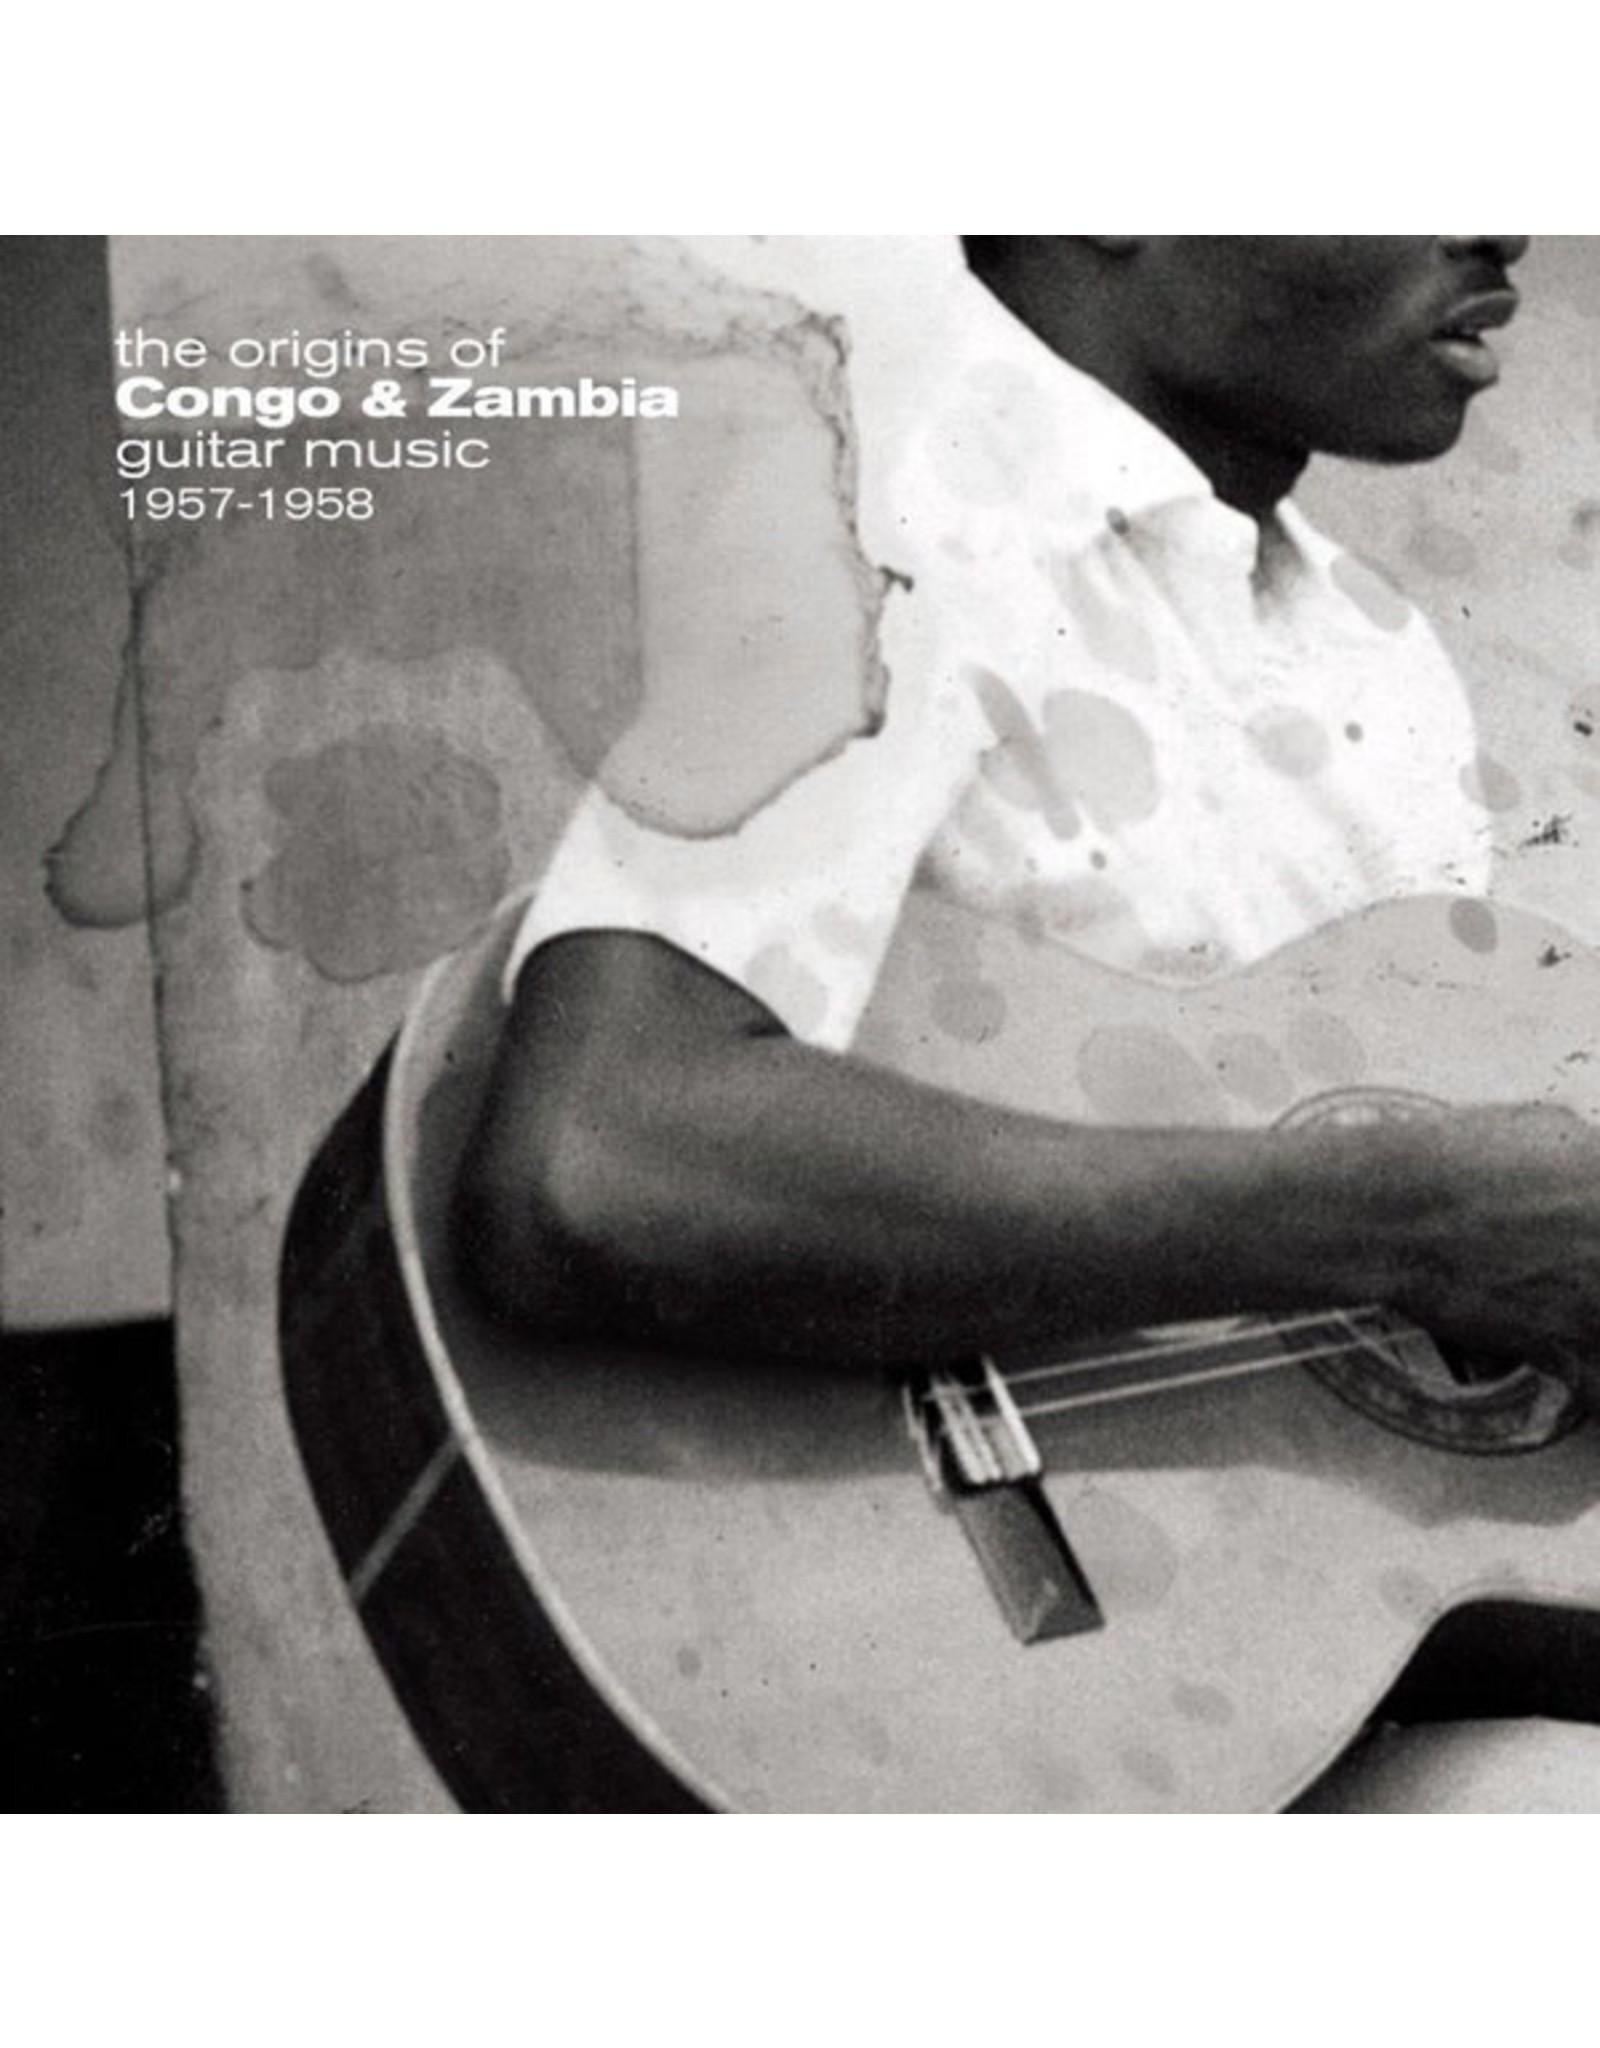 New Vinyl Various - The Origins Of Congo & Zambia Guitar Music 1957-1958 LP